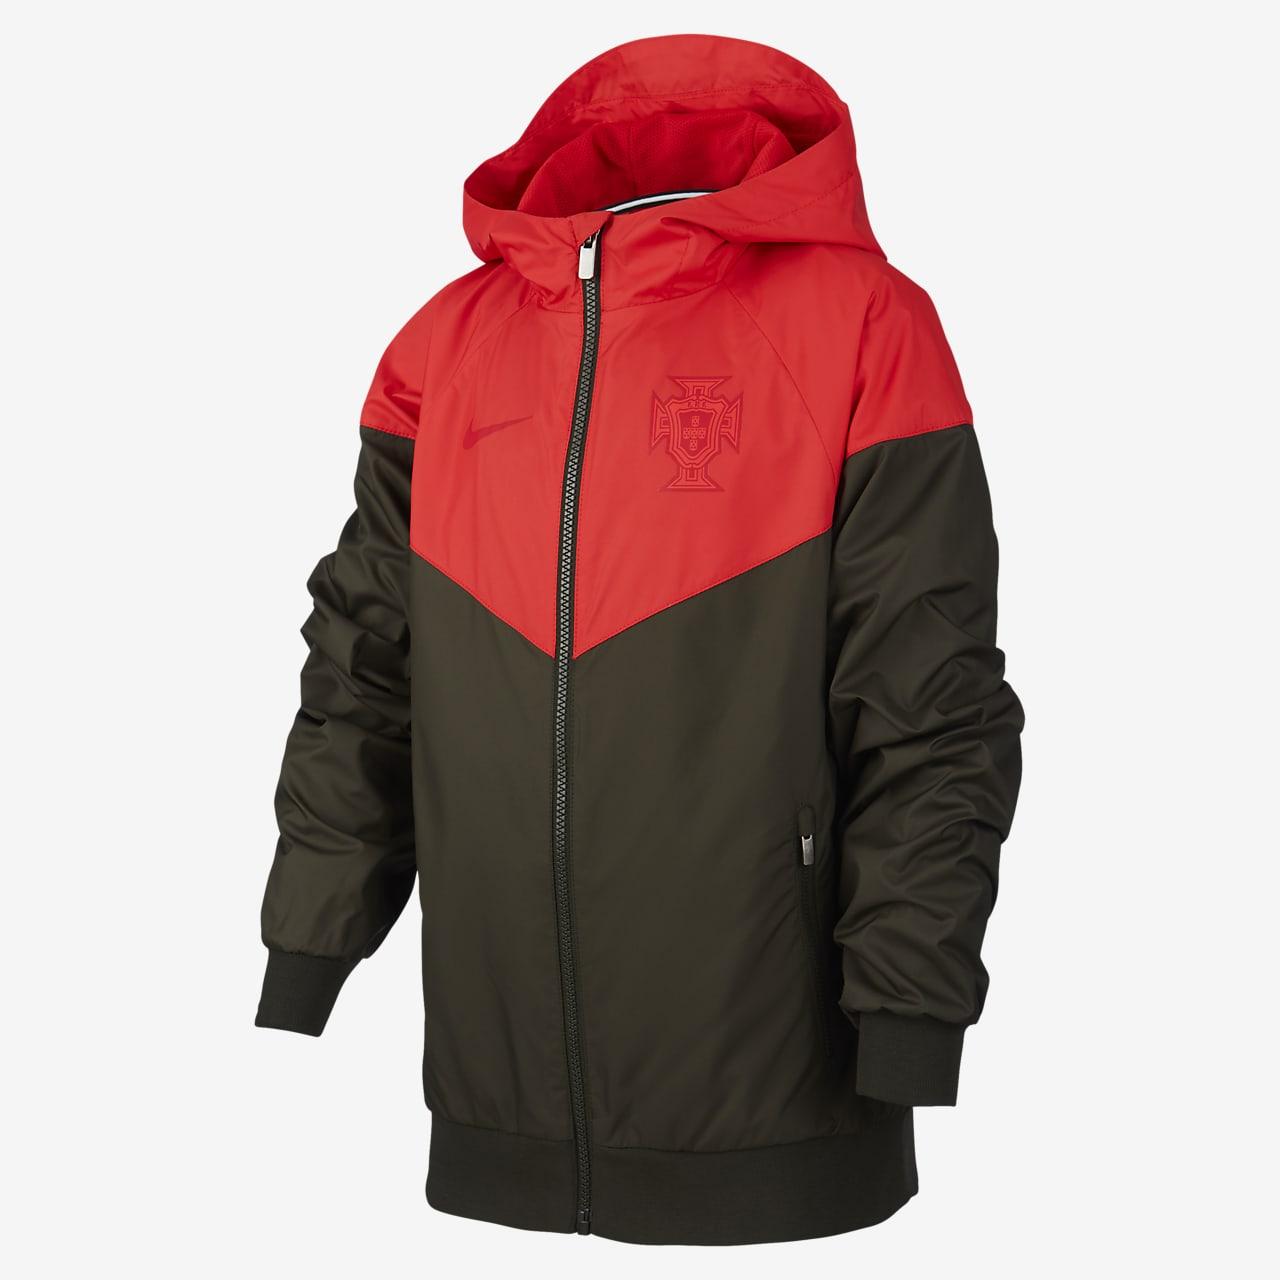 Portugal Windrunner Older Kids' Woven Jacket